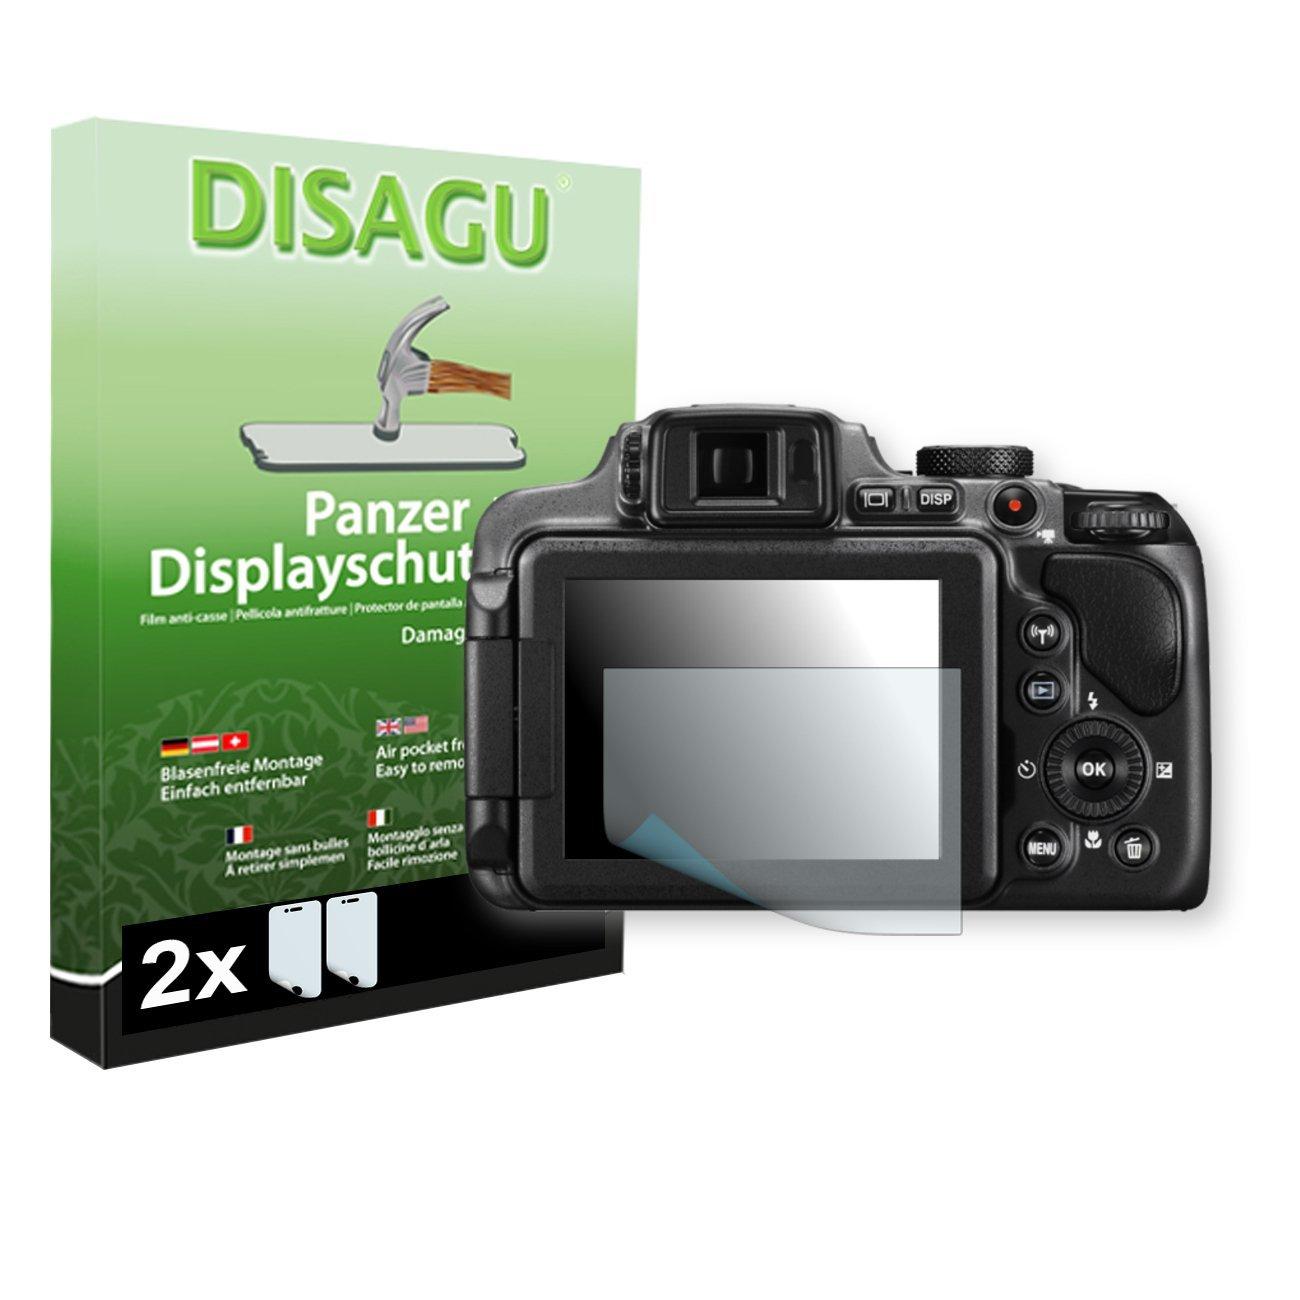 2 x DISAGU Armor screen protector for Nikon COOLPIX P610 screen fracture protection film